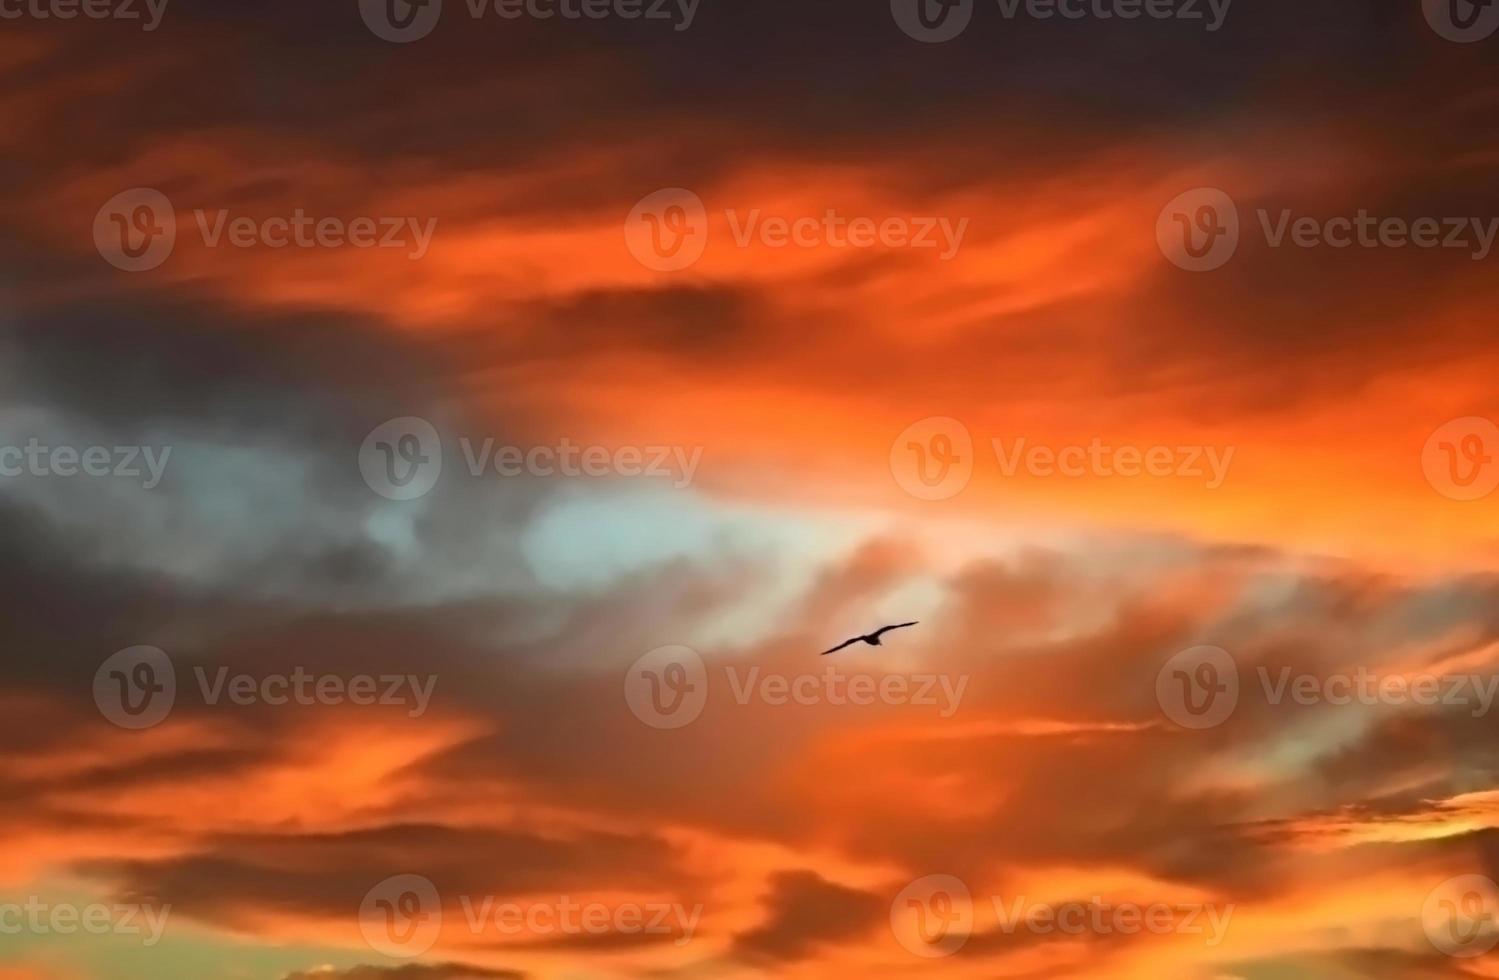 fågelflygning på en avfyrt himmel foto